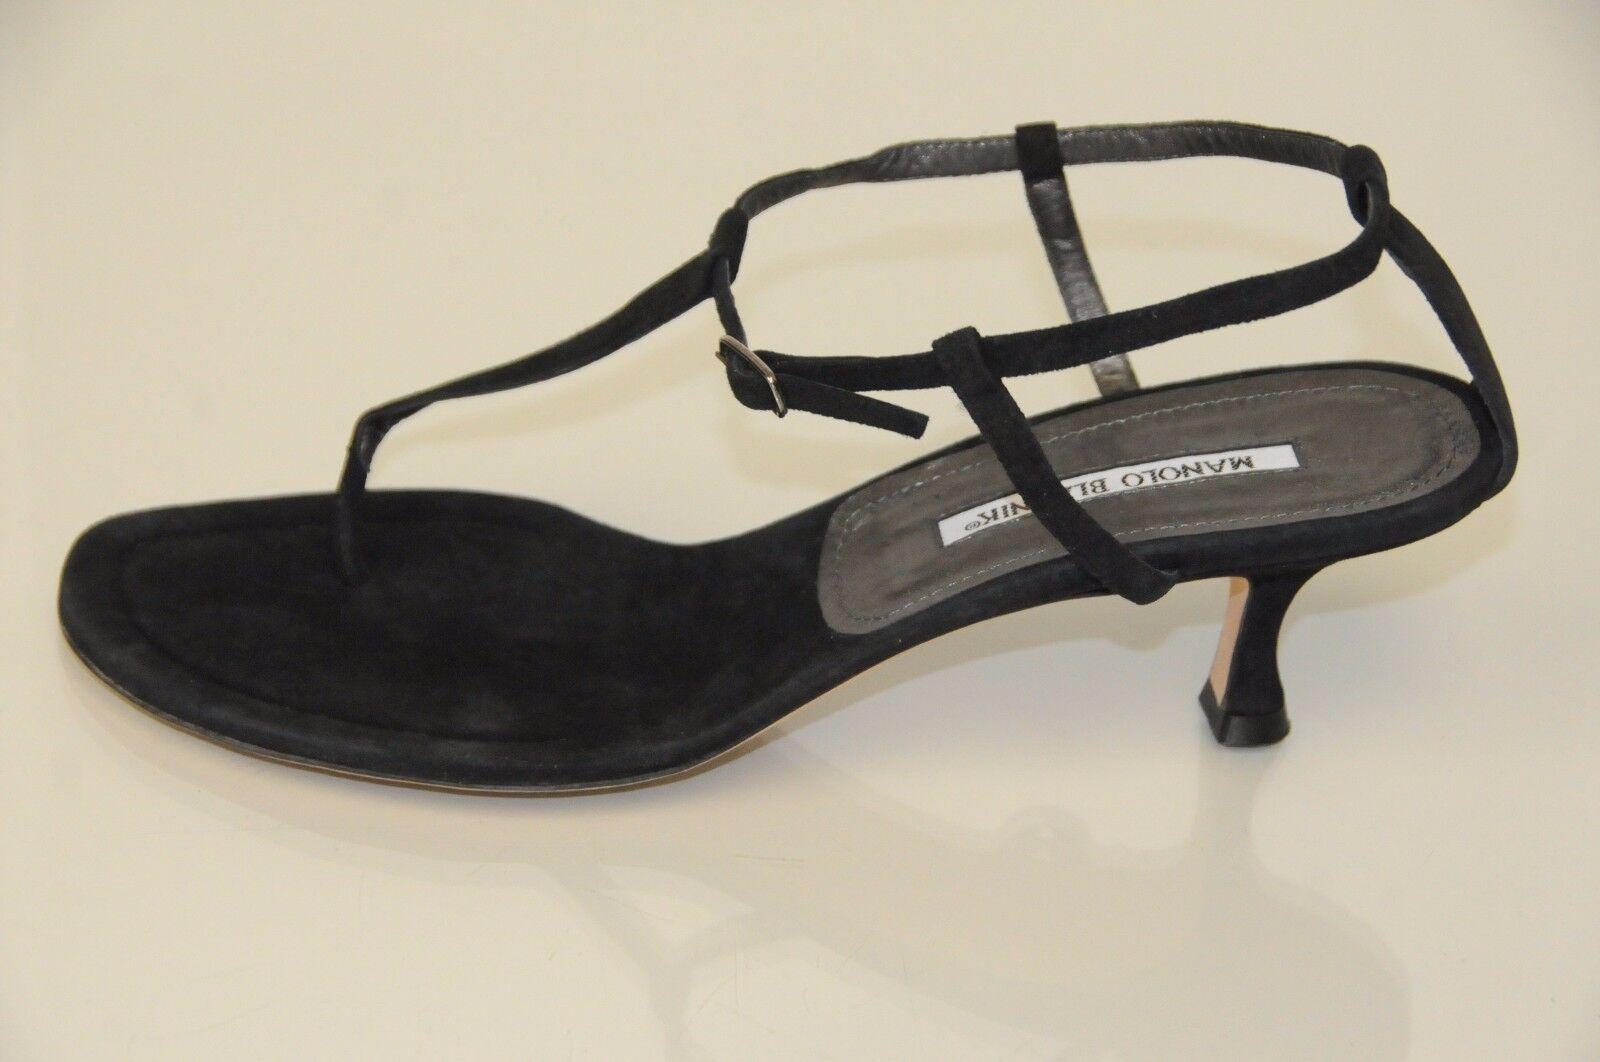 New MANOLO BLAHNIK Black Suede Thong  t t  strap SANDALS SHOES Kitten Heel 40.5 40 0874c8